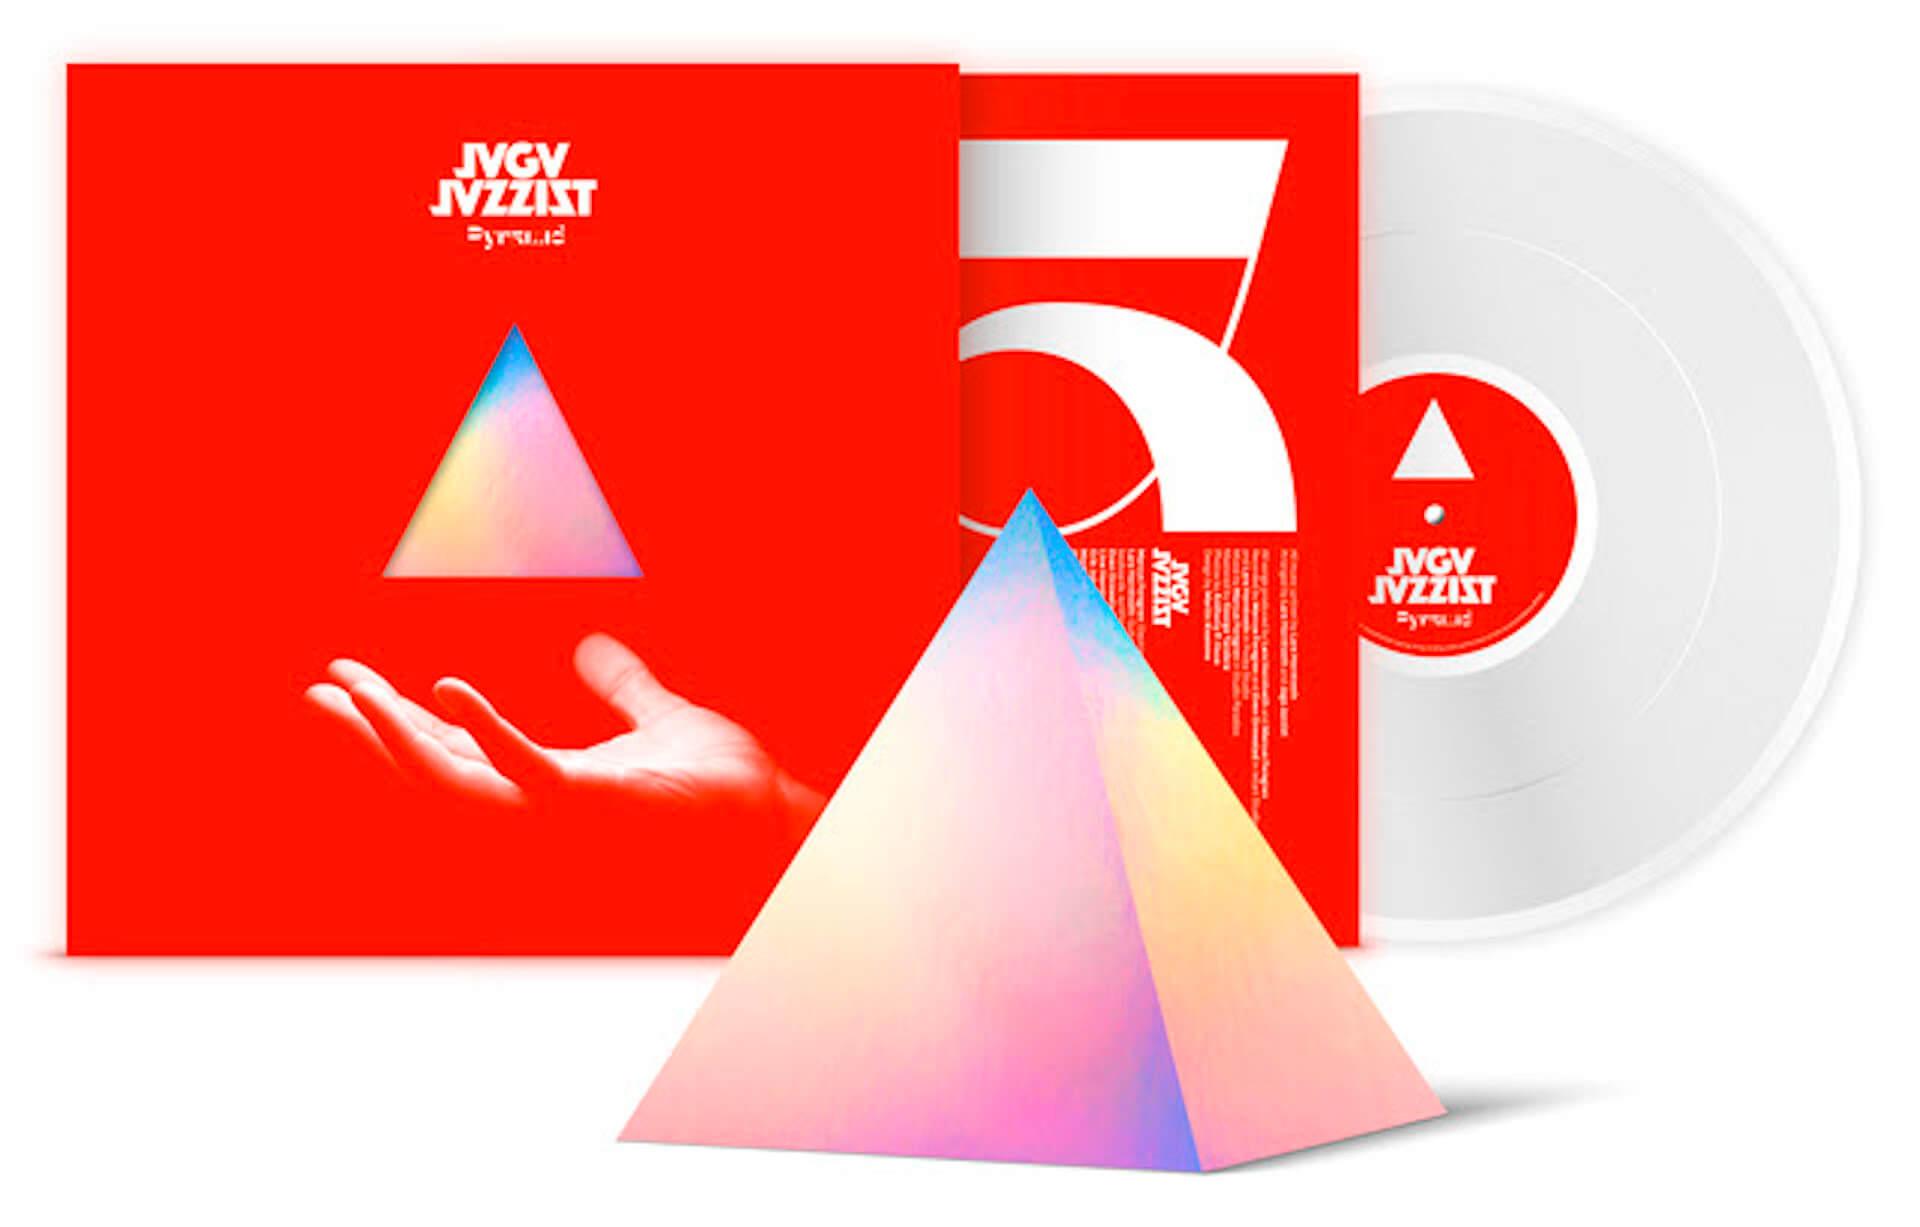 JAGA JAZZISTが〈Brainfeeder〉からリリースする作品『Pyramid』日本盤CDにボーナストラック収録決定! music200416_jagajazzist_03